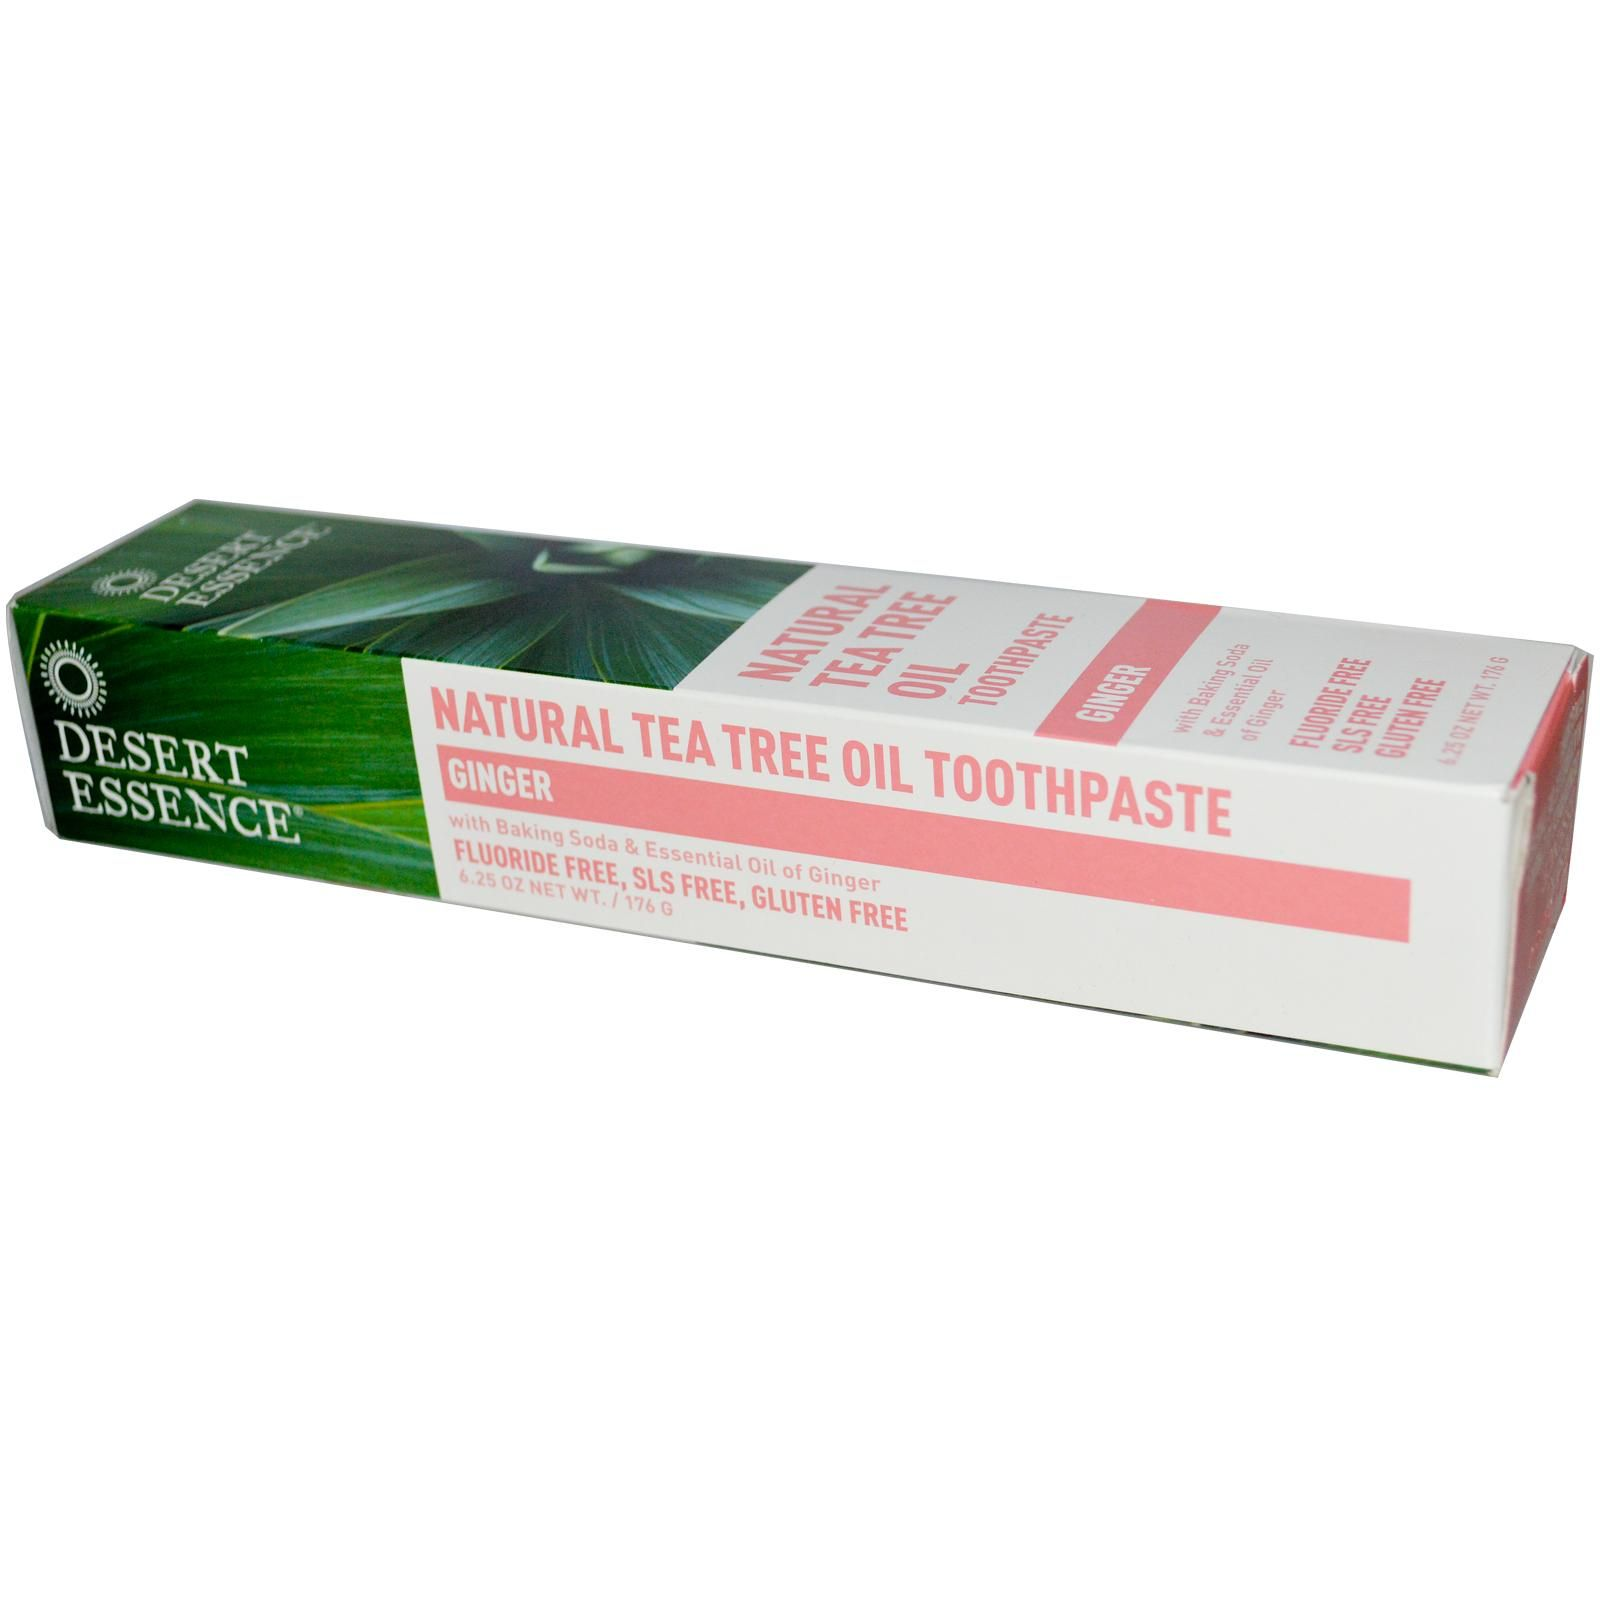 Desert Essence, Natural Tea Tree Oil Toothpaste, Ginger, 6.25 oz (176 g) - iHerb.com